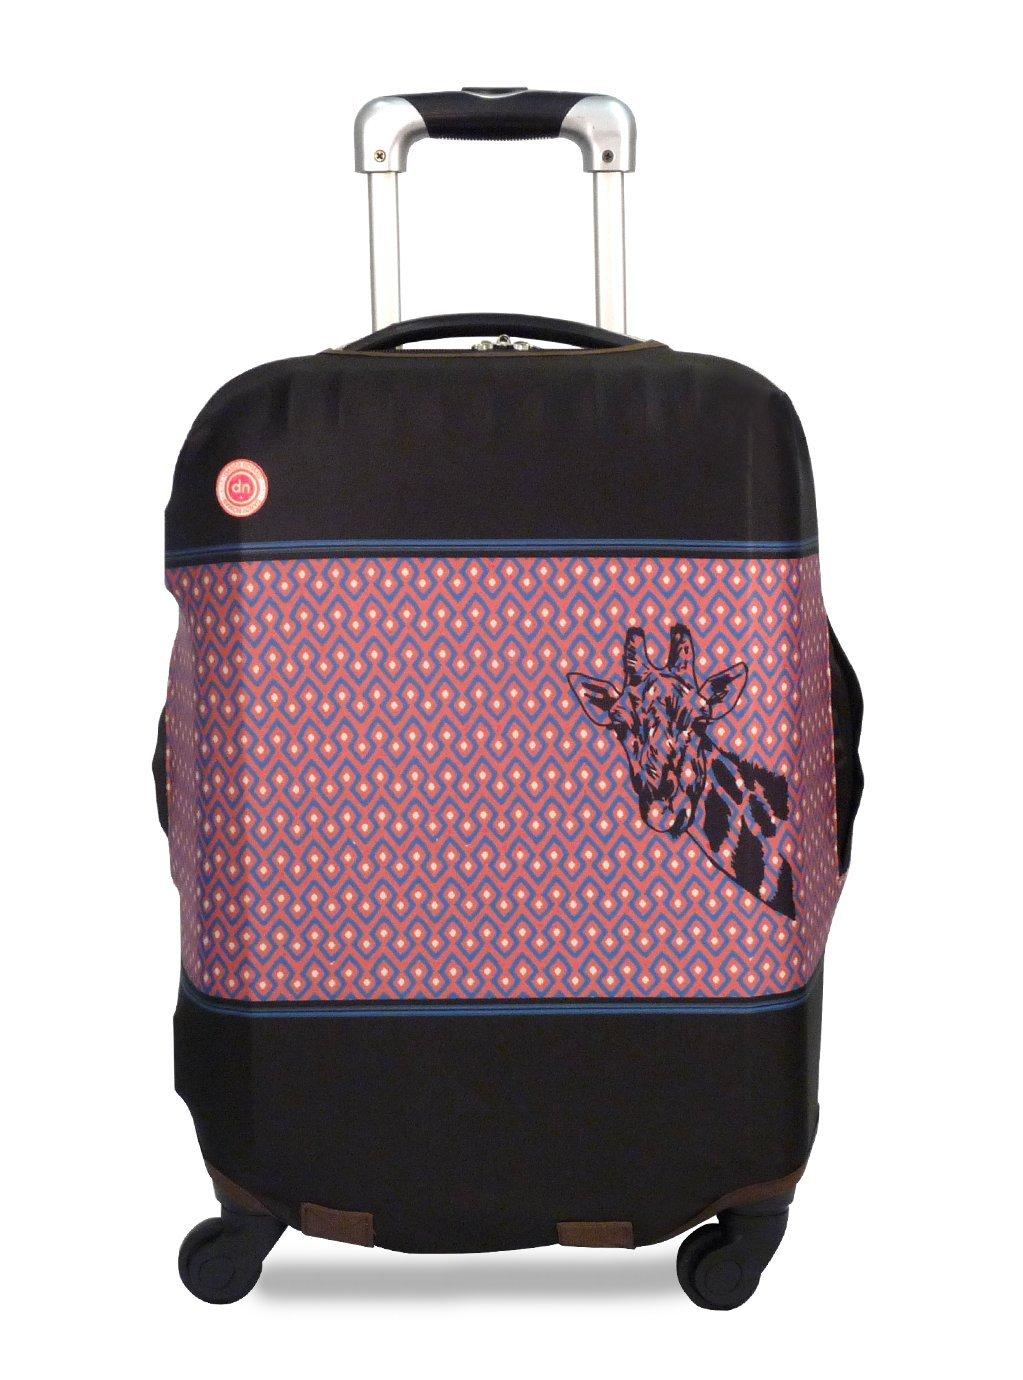 Dandy Nomad Housse de valise Serengeti Marron Regenhülle, 26 cm, Braun (Marron)